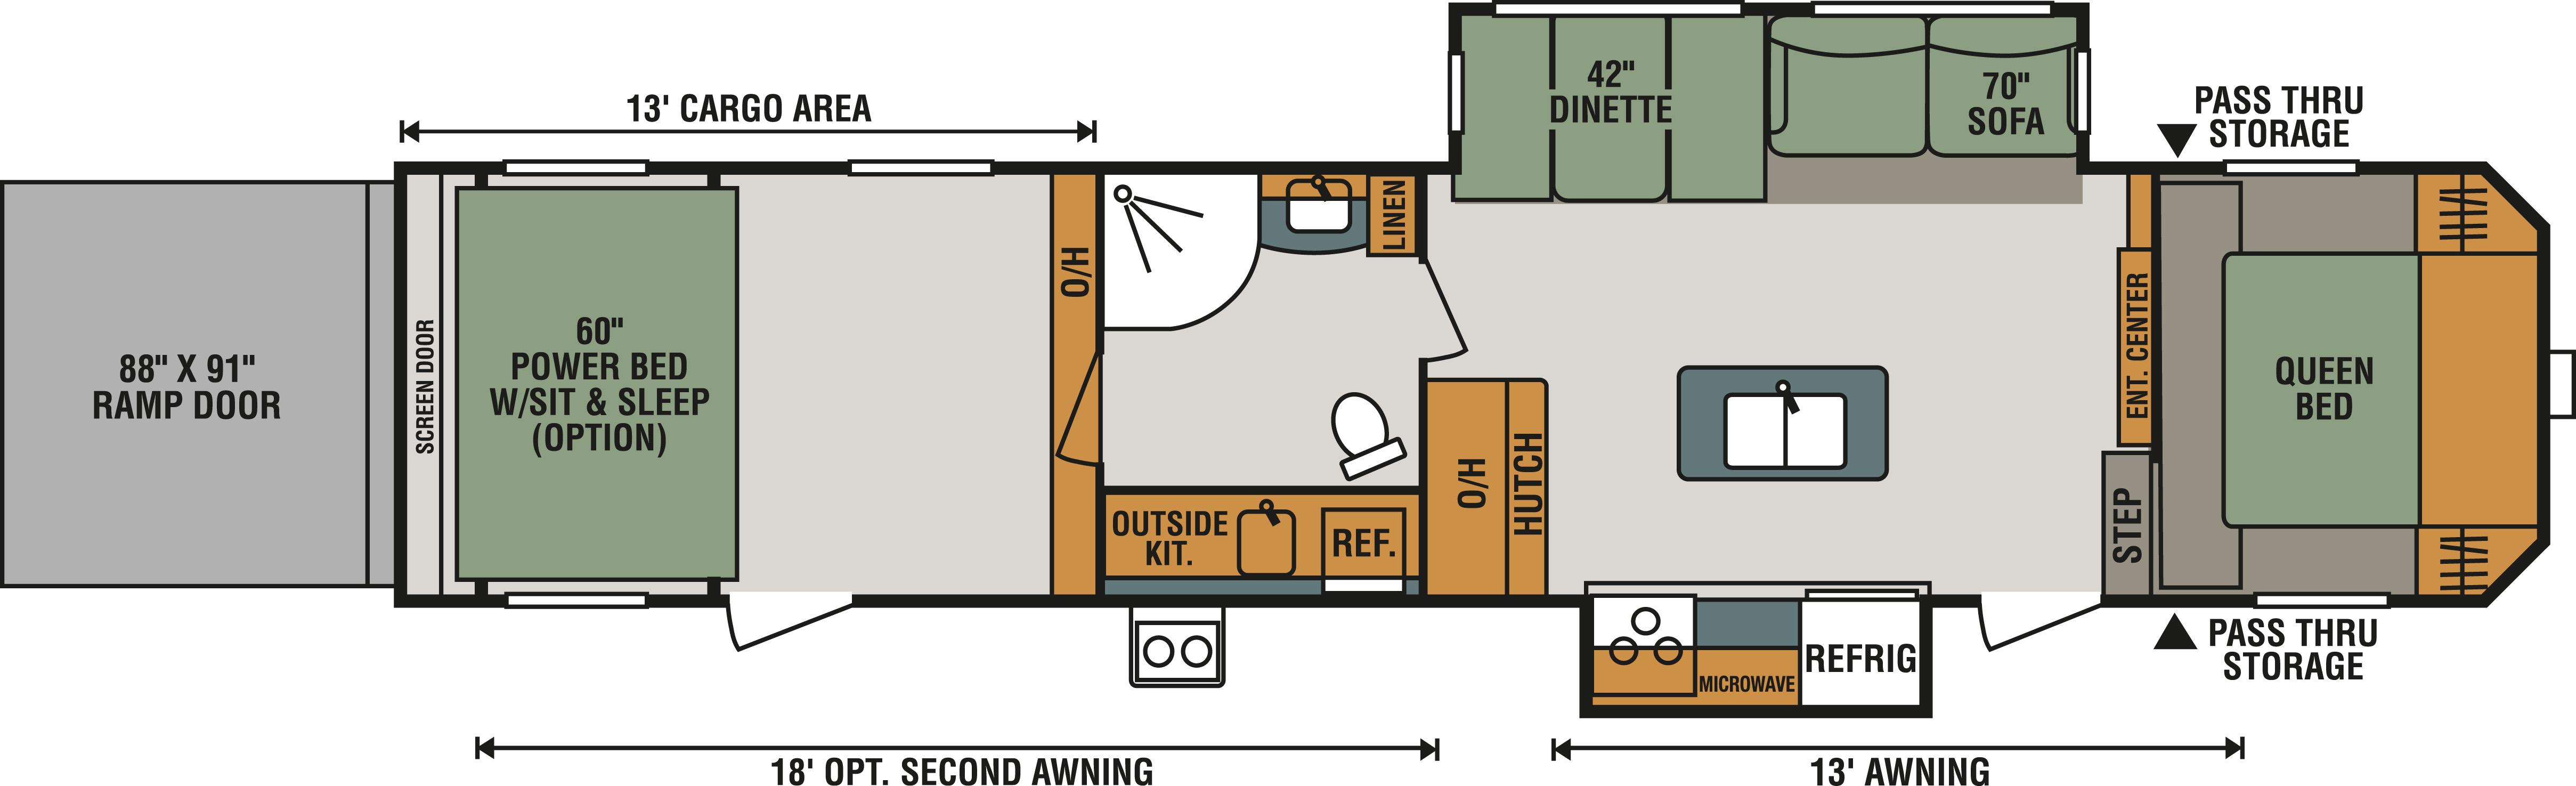 352TH13 Floorplan